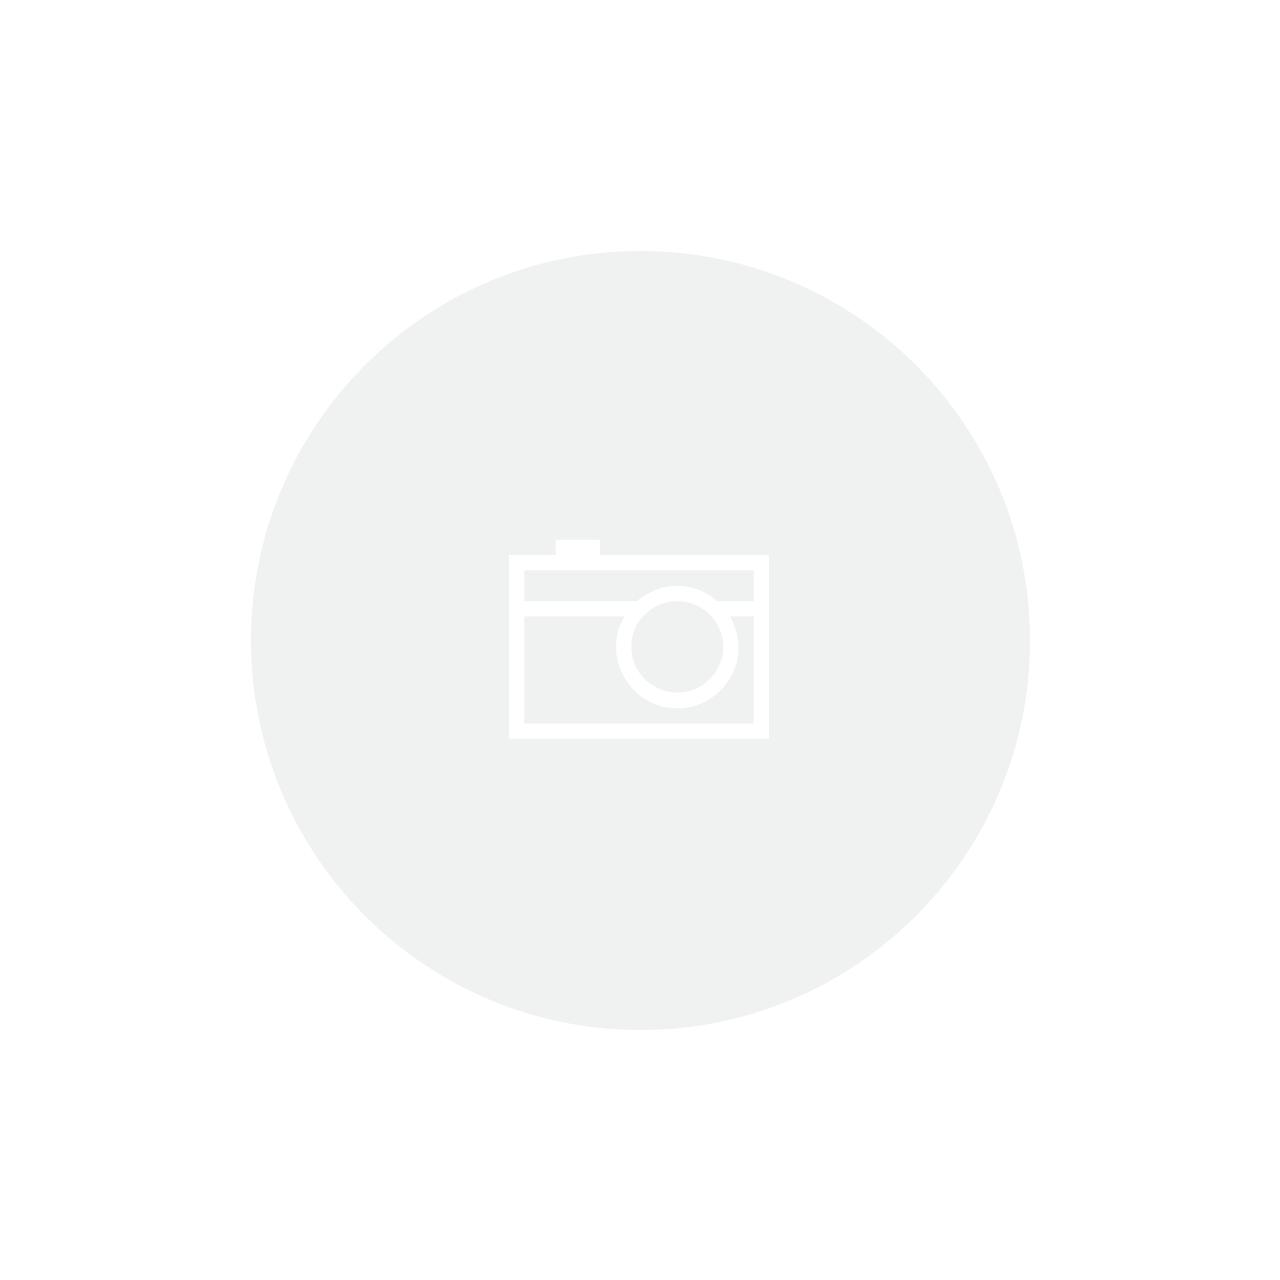 Brinco Réplica Pena Ear Cuff Semijoias Antialérgicas Banhados a Ouro 22k